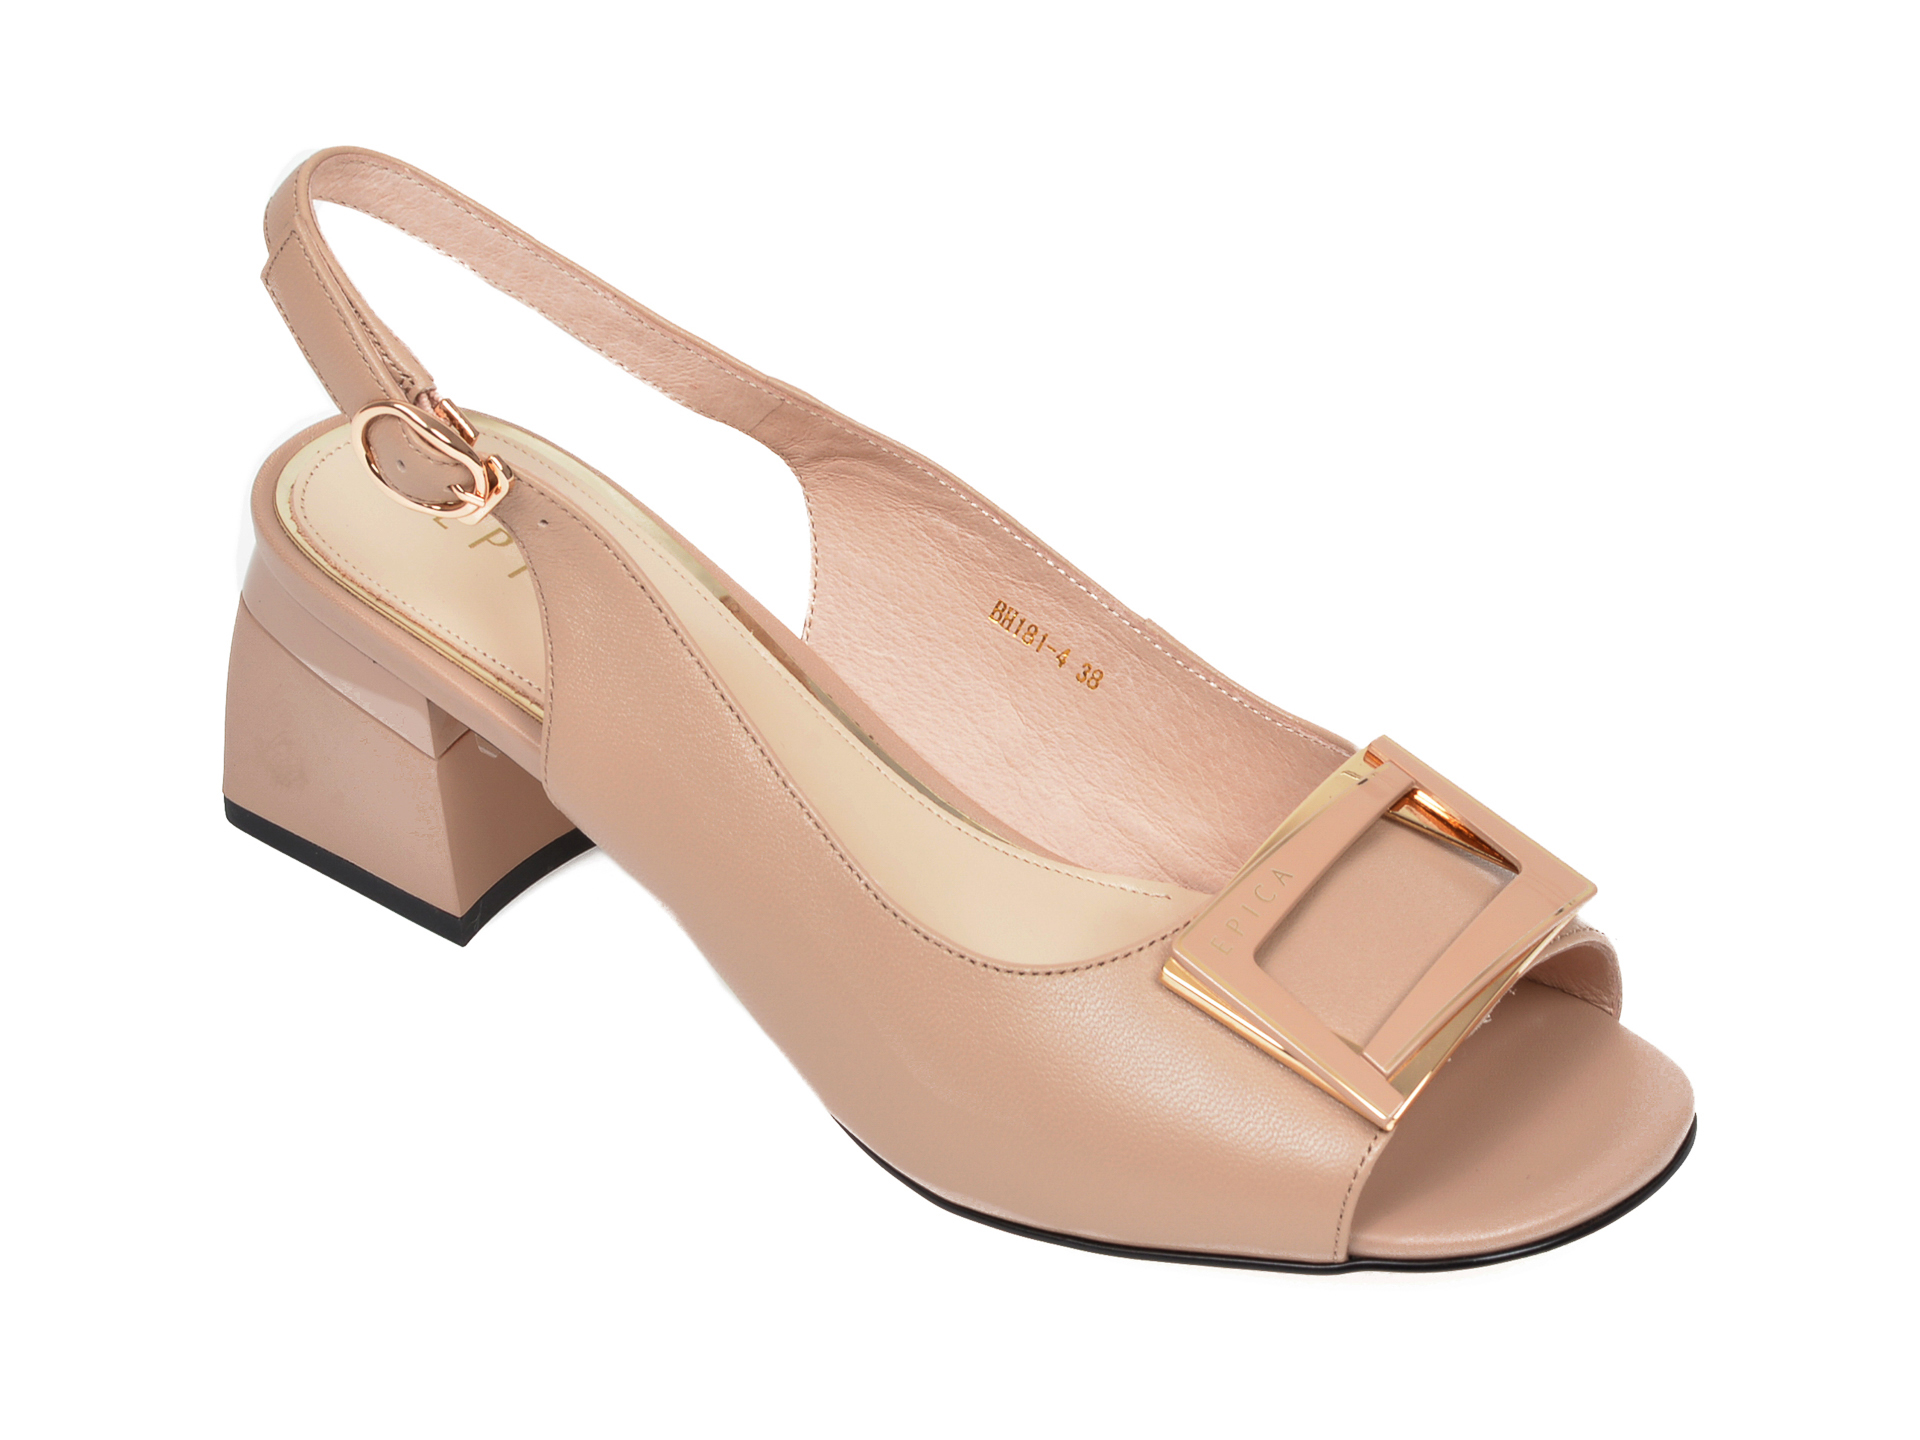 Sandale EPICA bej, BH181, din piele naturala